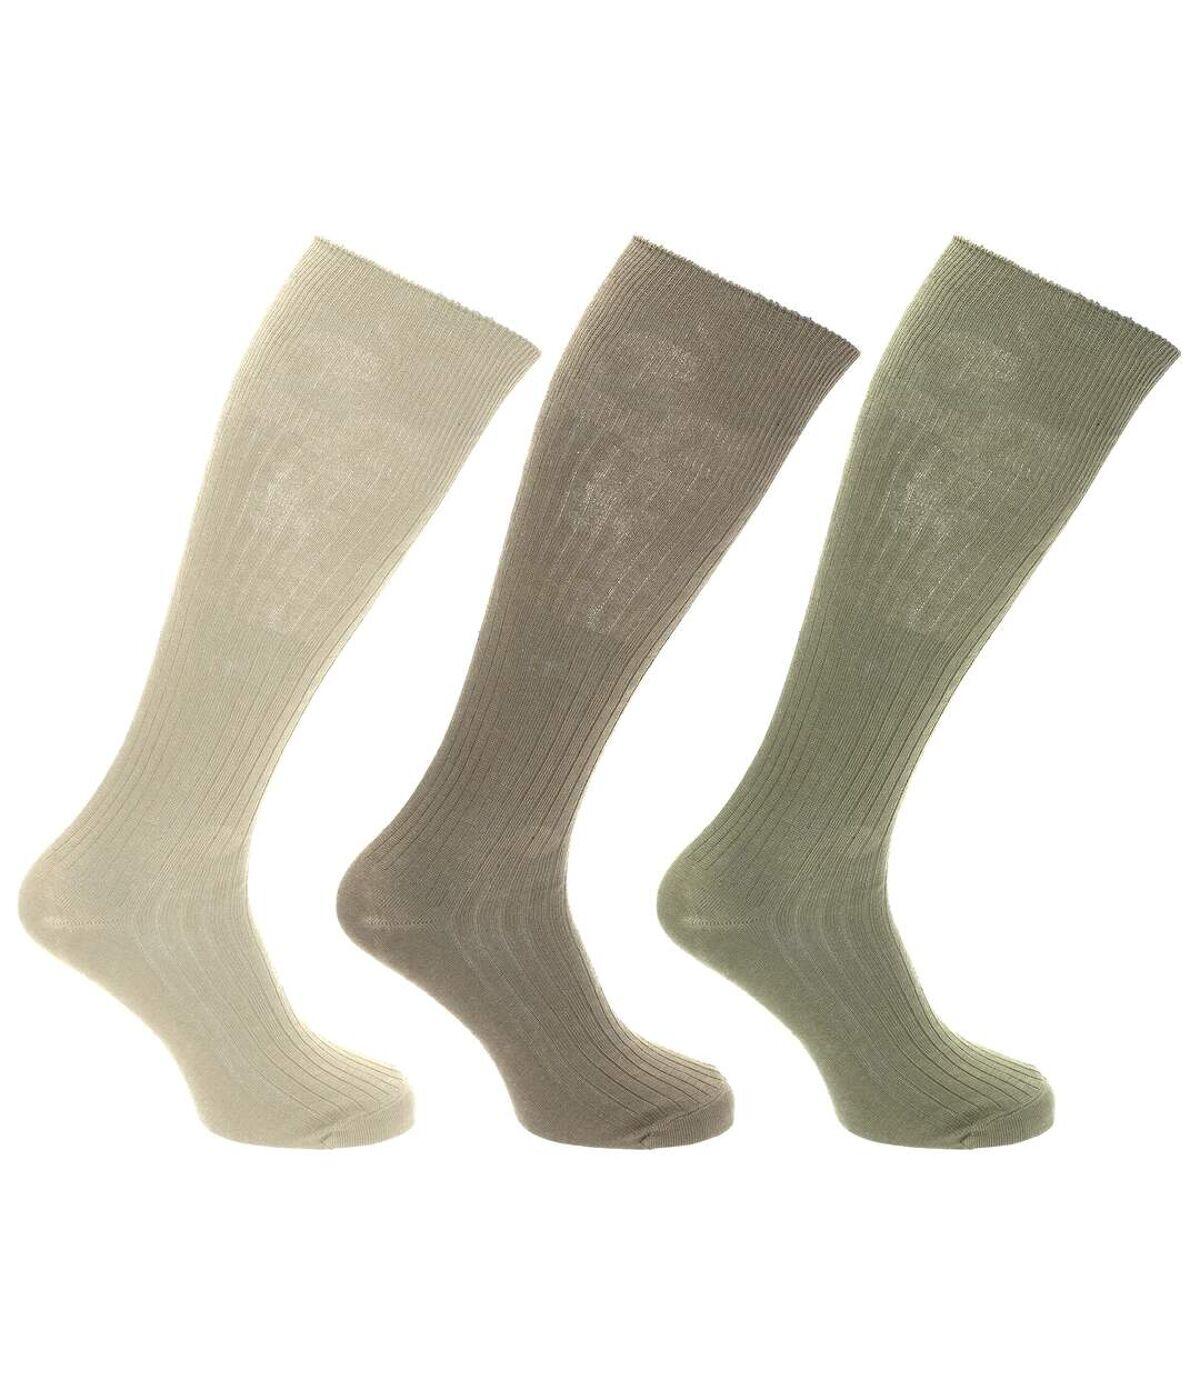 Mens 100% Cotton Ribbed Knee High Socks (Pack Of 3) (Cream/Light Grey/Khaki) - UTMB489